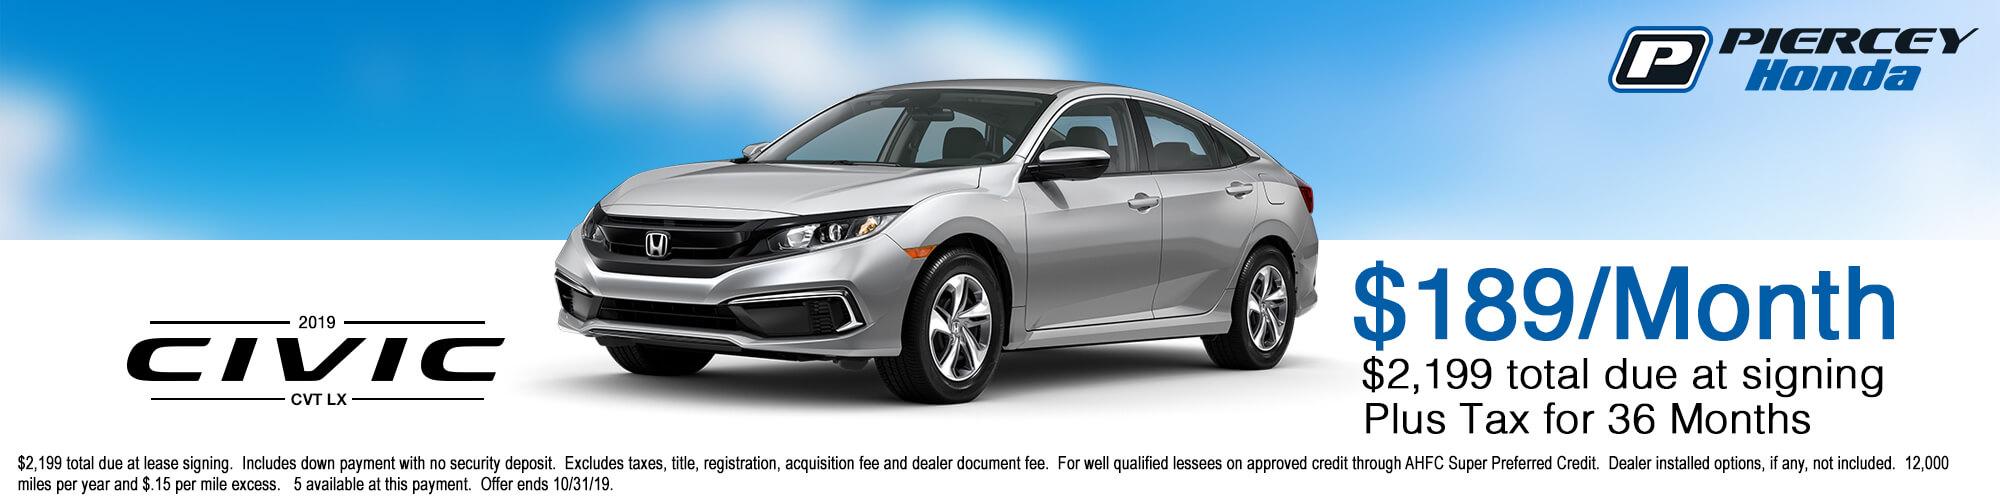 2019 Honda Civic Special Offer